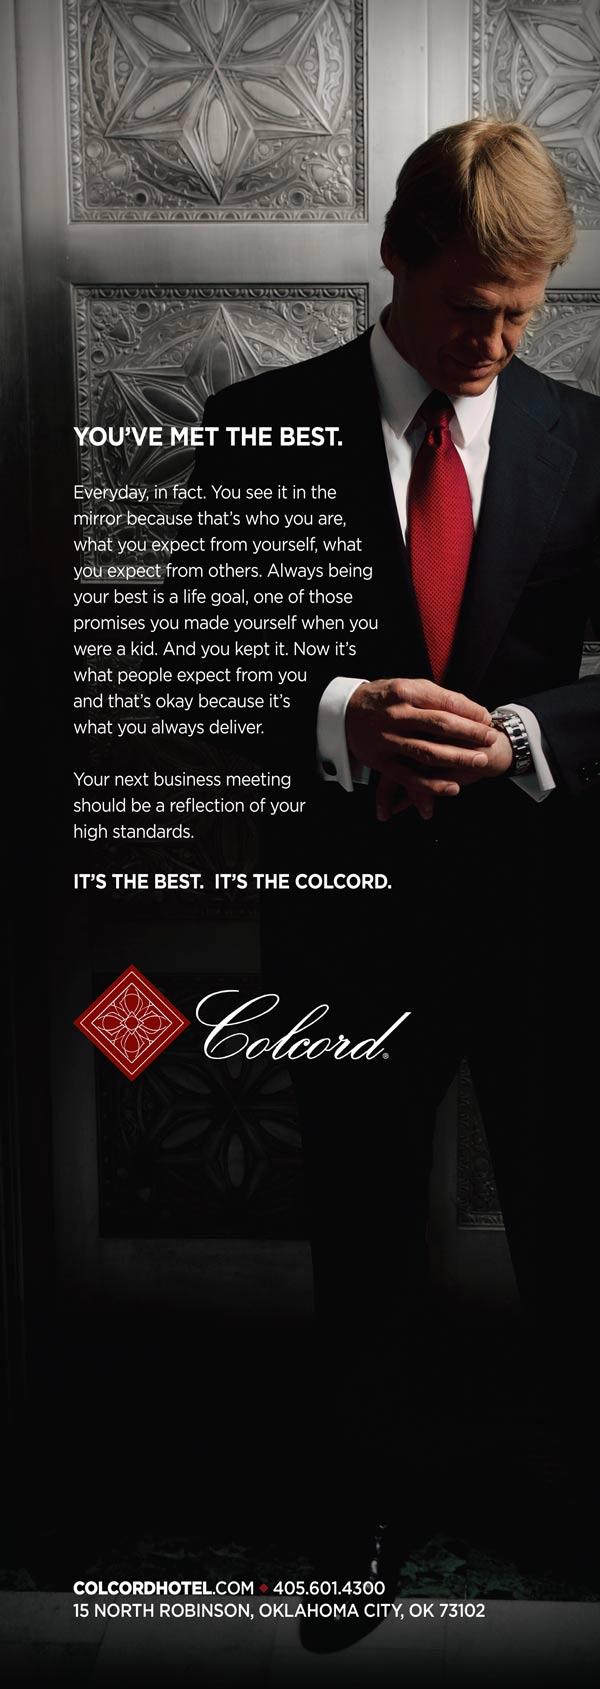 Colcord_Quarter_Man003